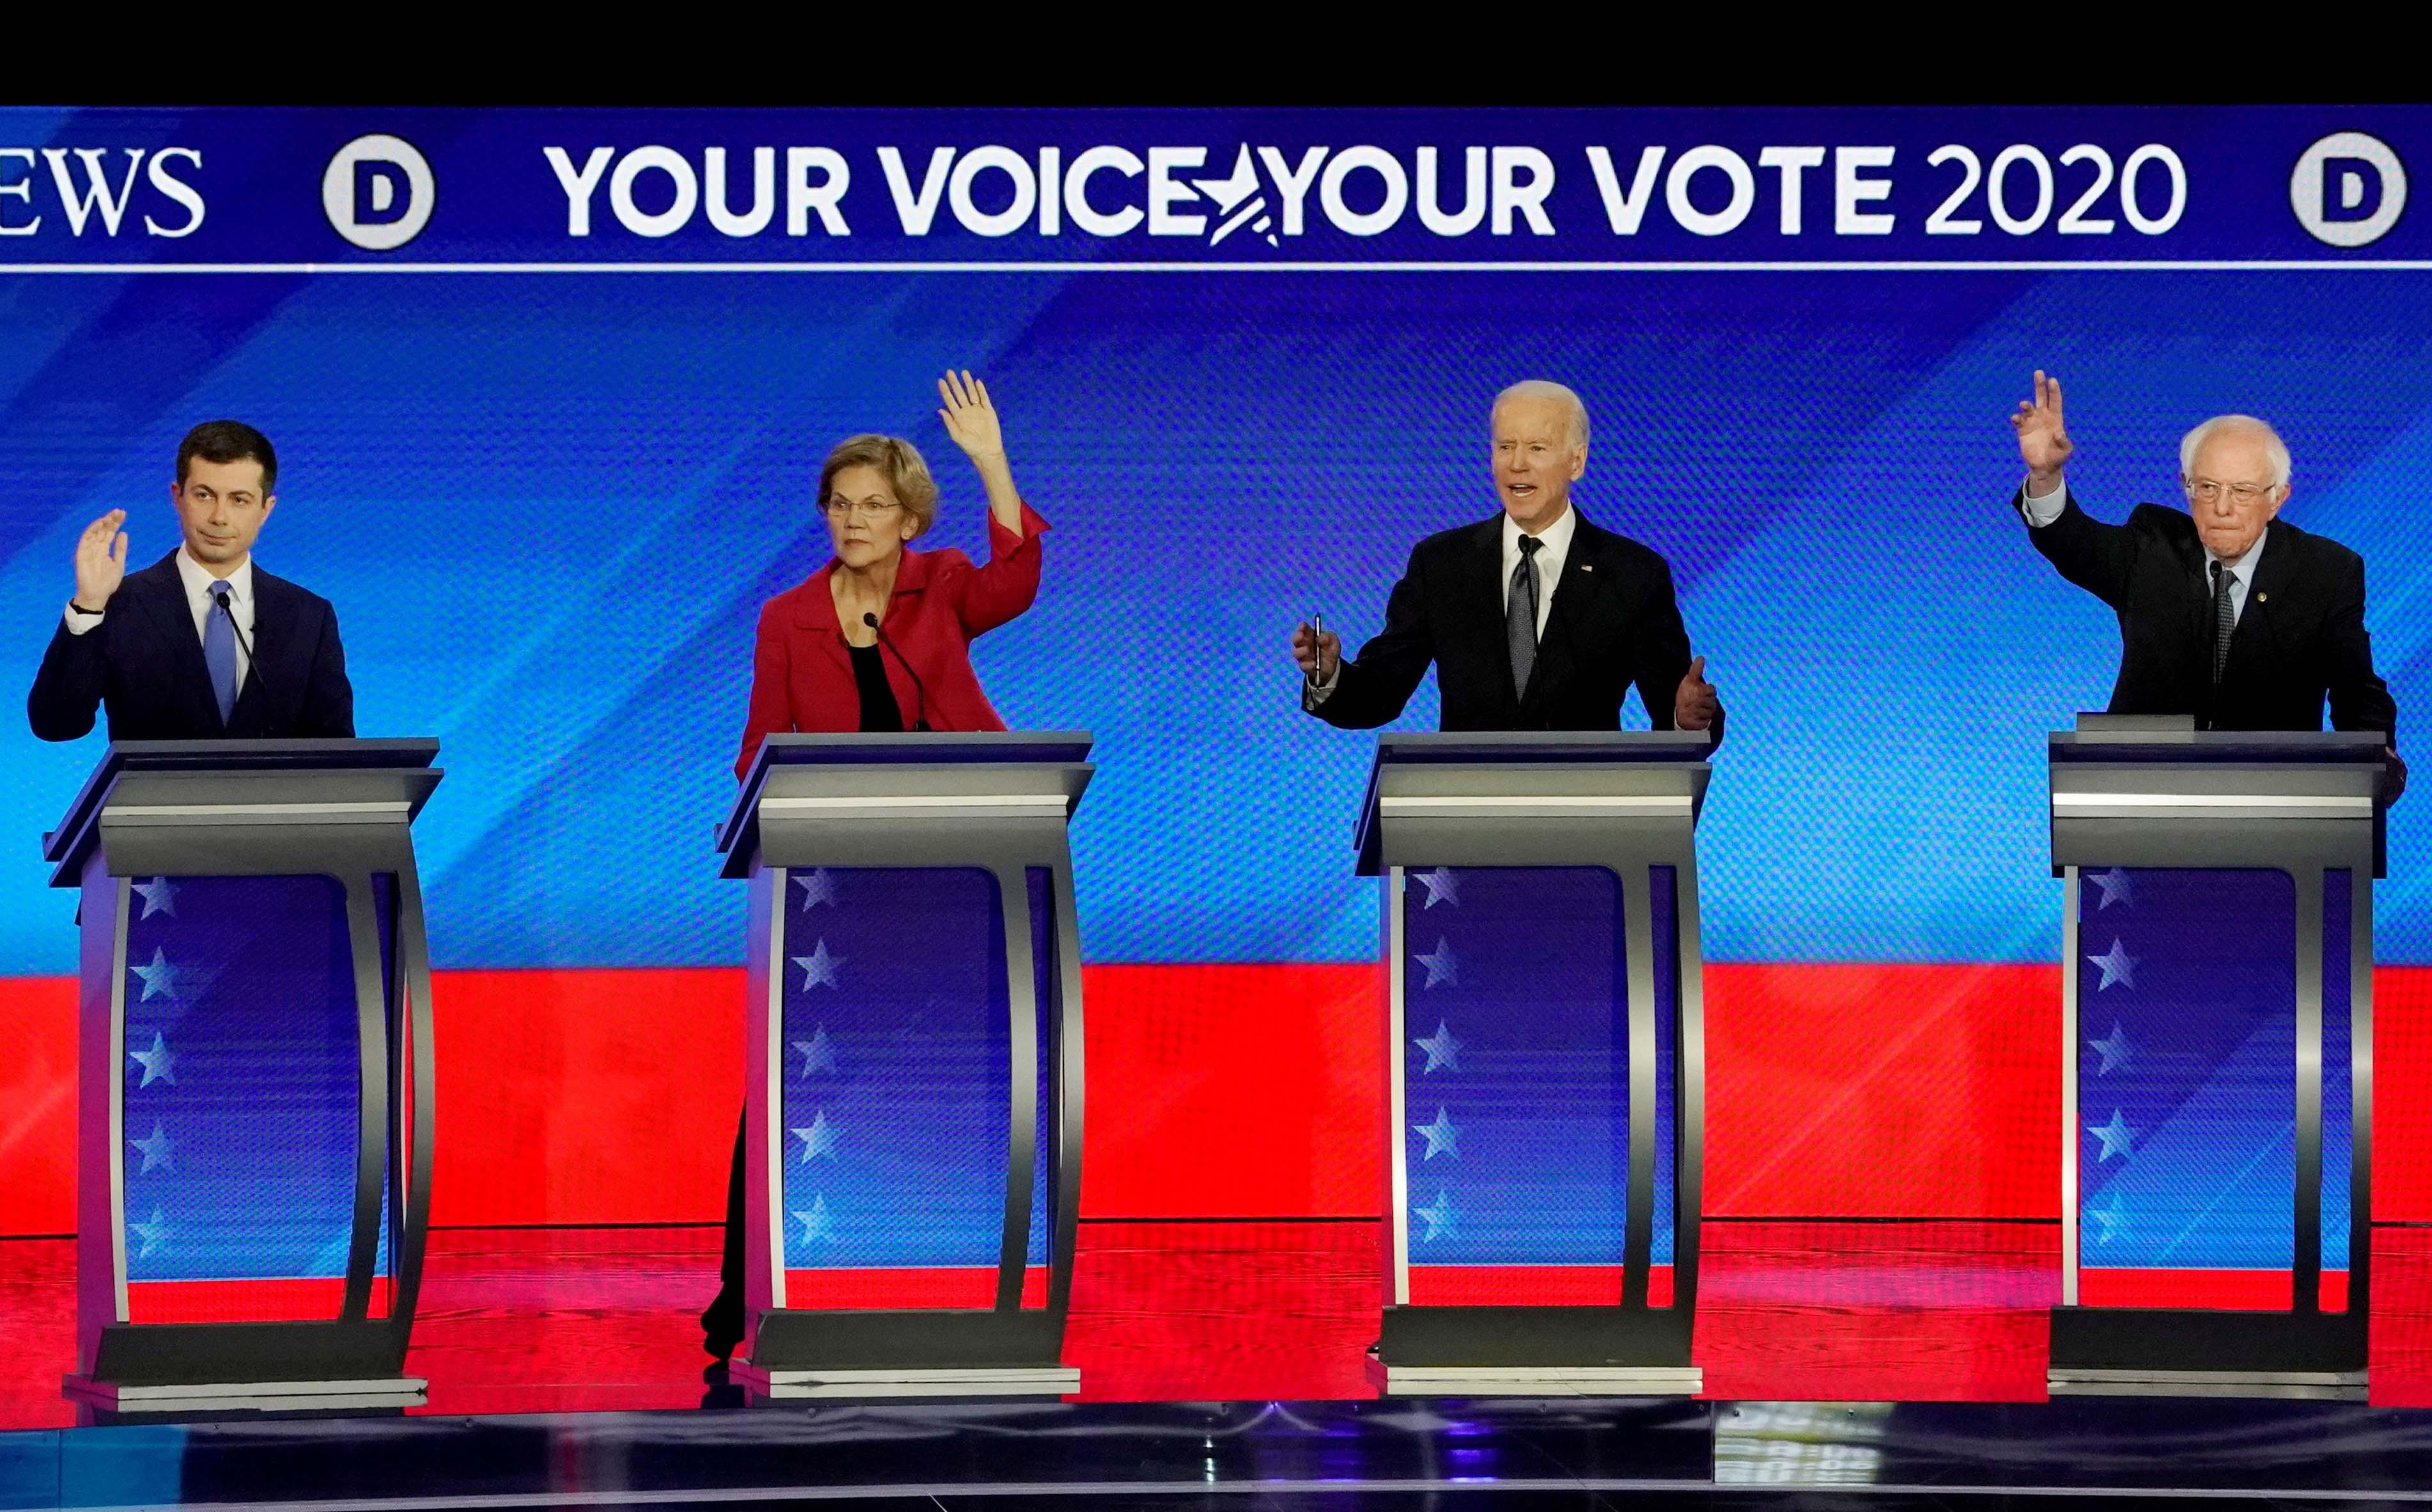 Democratic2020 USpresidential candidates (left to right) former South Bend Mayor Pete Buttigieg, Senator Elizabeth Warren, former Vice President Joe Biden and Senator Bernie Sanders participate in the eighthDemocratic2020 presidentialdebate.